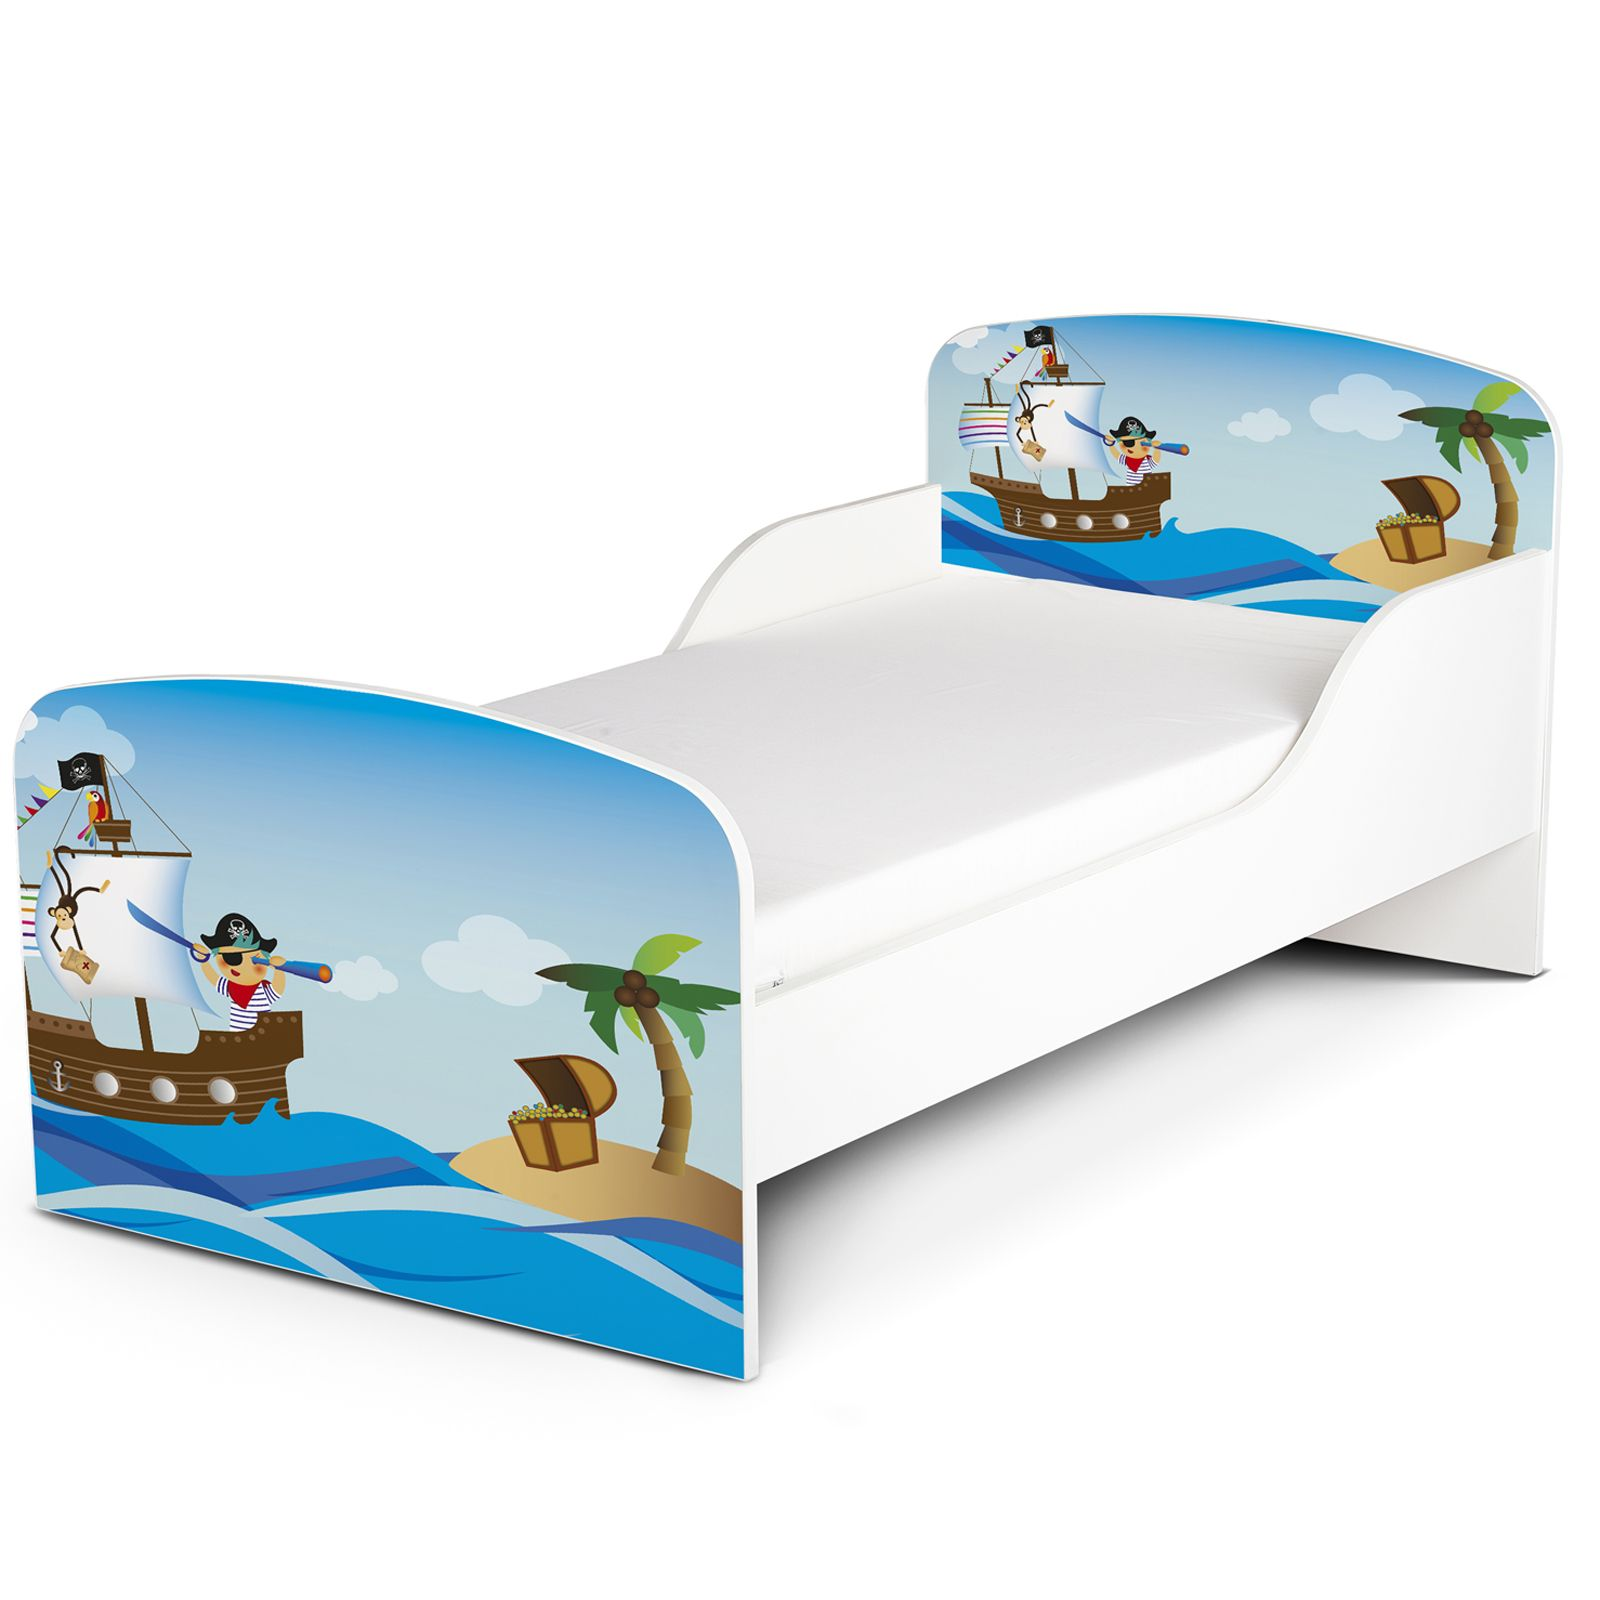 PIRATES MDF TODDLER BED NEW WOODEN KIDS FURNITURE EBay